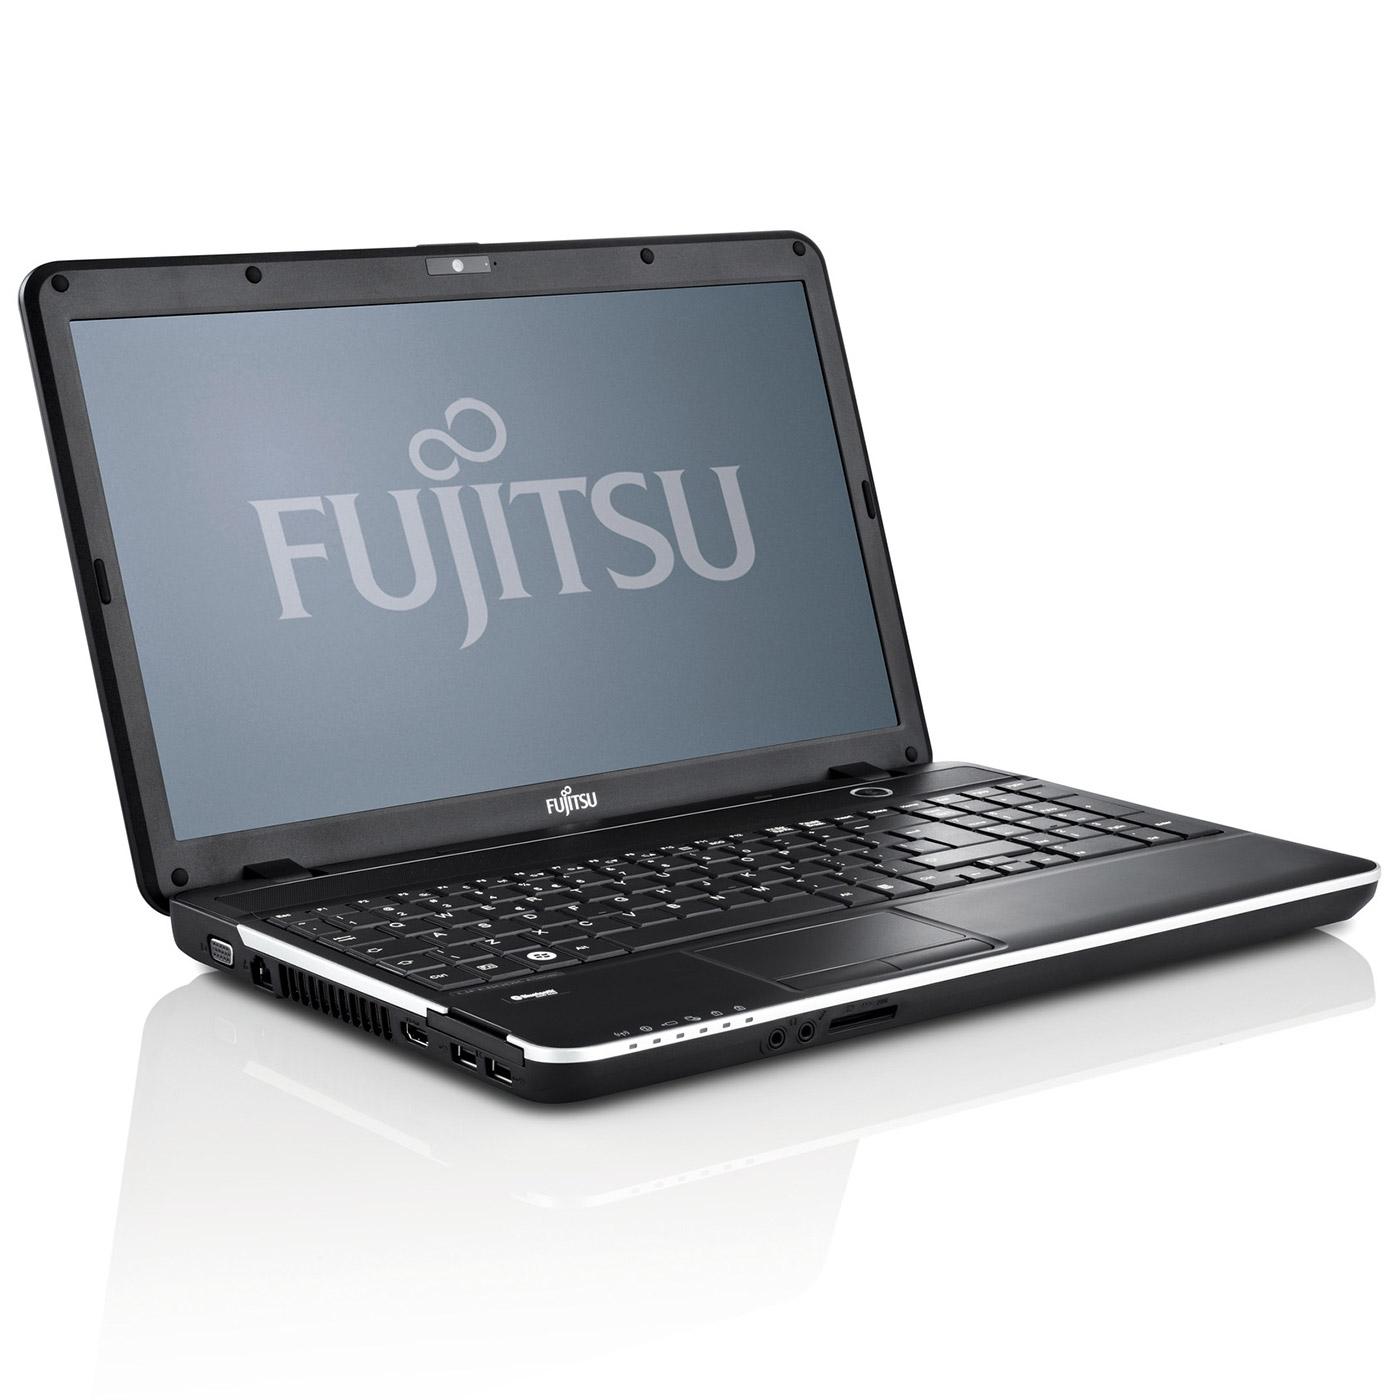 fujitsu lifebook a512 vfy a5120m13a1fr pc portable. Black Bedroom Furniture Sets. Home Design Ideas